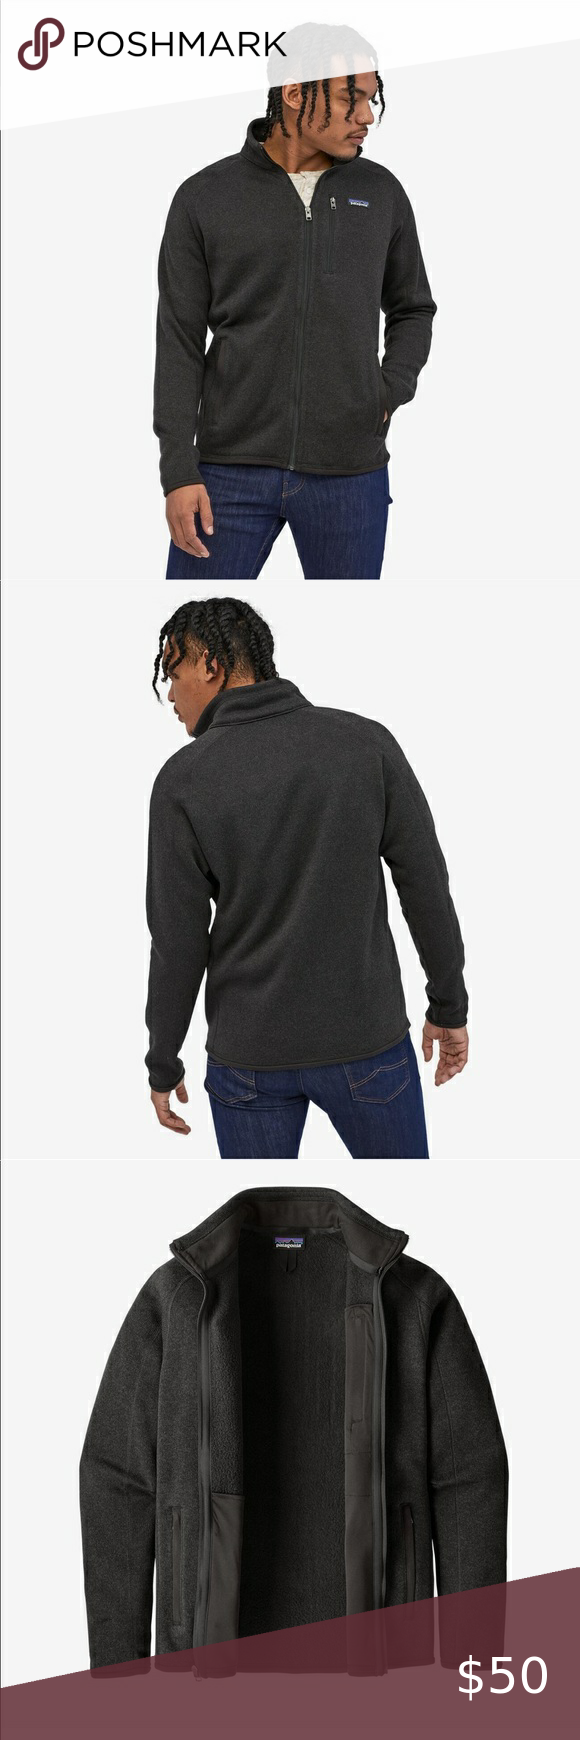 Patagonia Men's Better Sweater Fleece Jacket Black in 2020